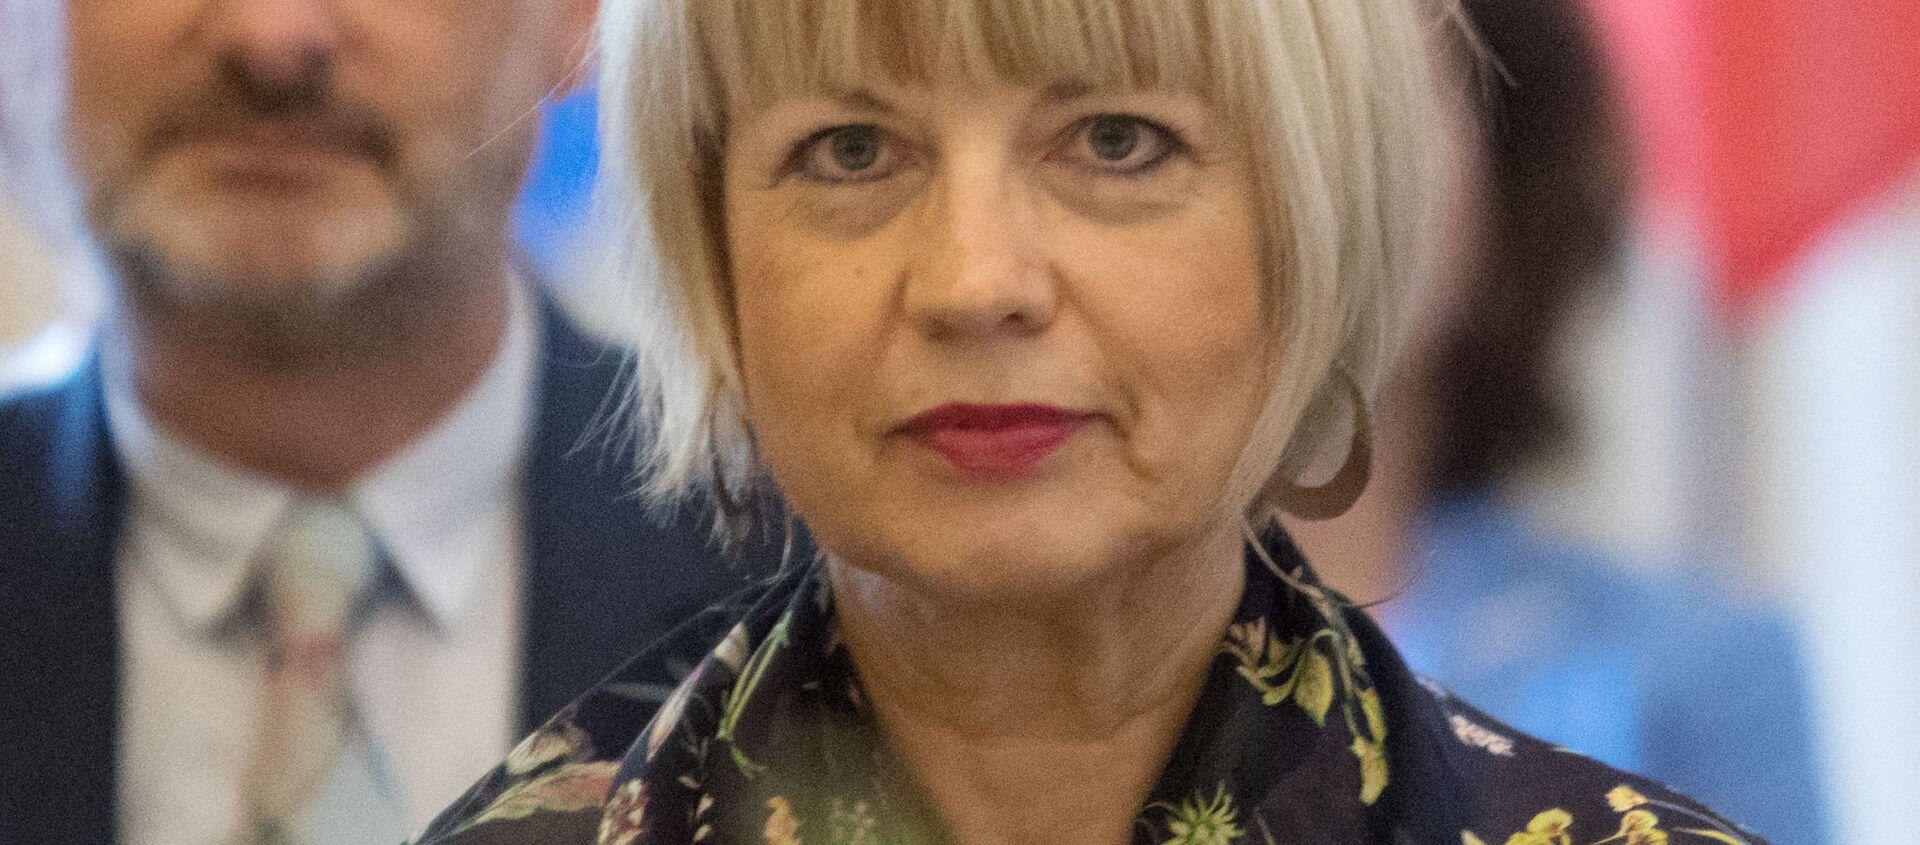 Sekretarz generalna OBWE Helga Schmid. - Sputnik Polska, 1920, 28.05.2021